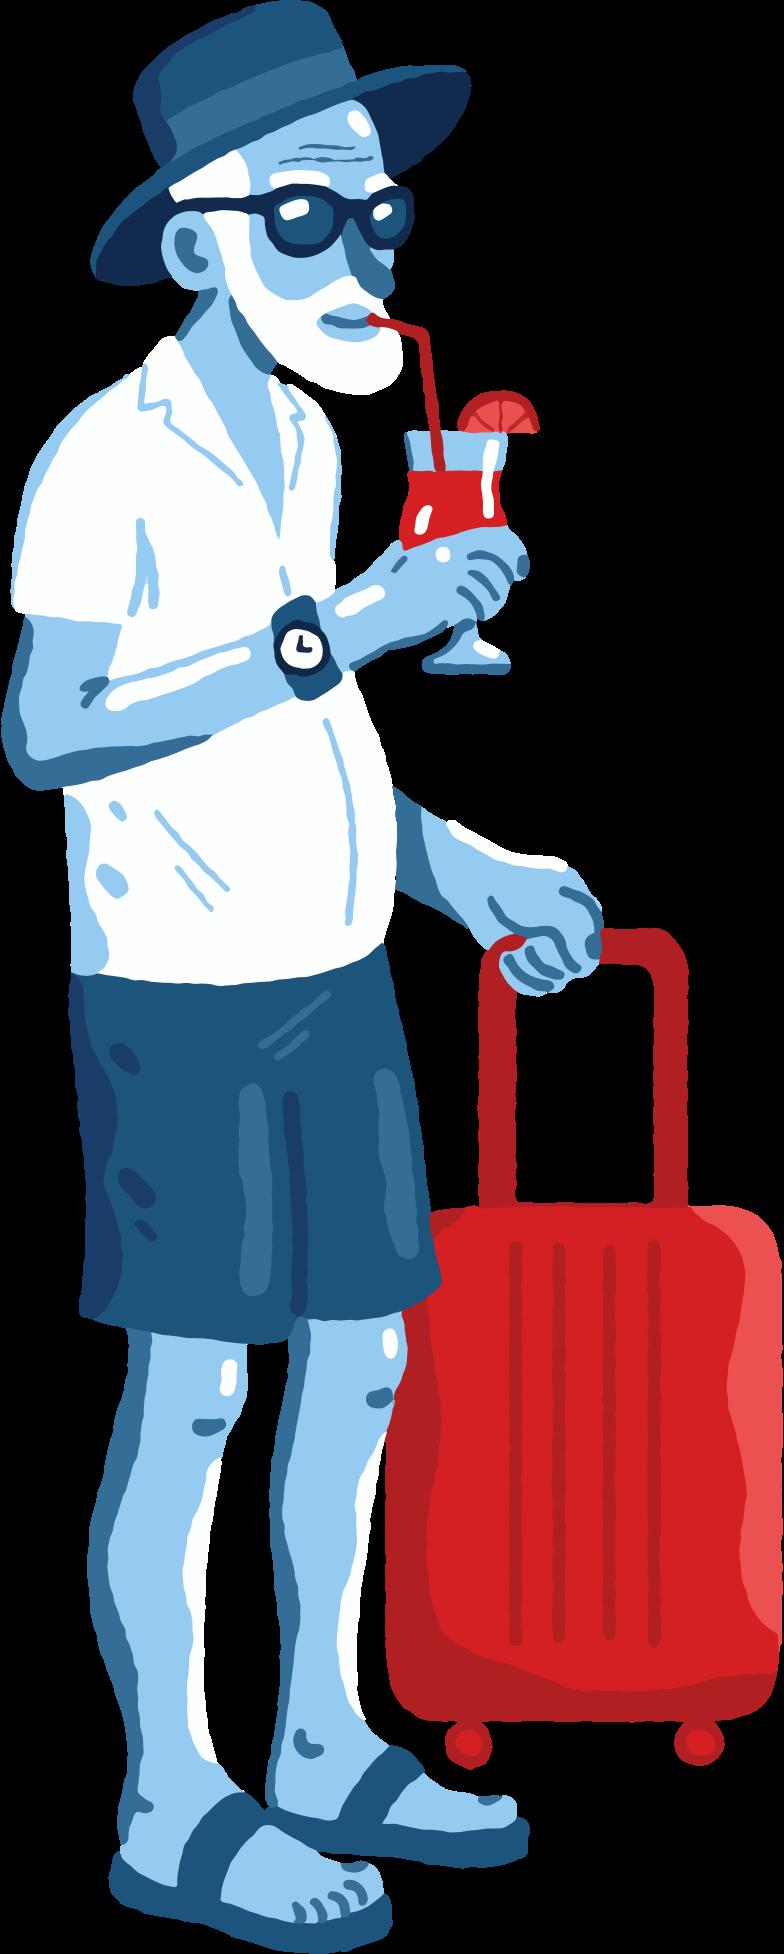 retire Clipart illustration in PNG, SVG